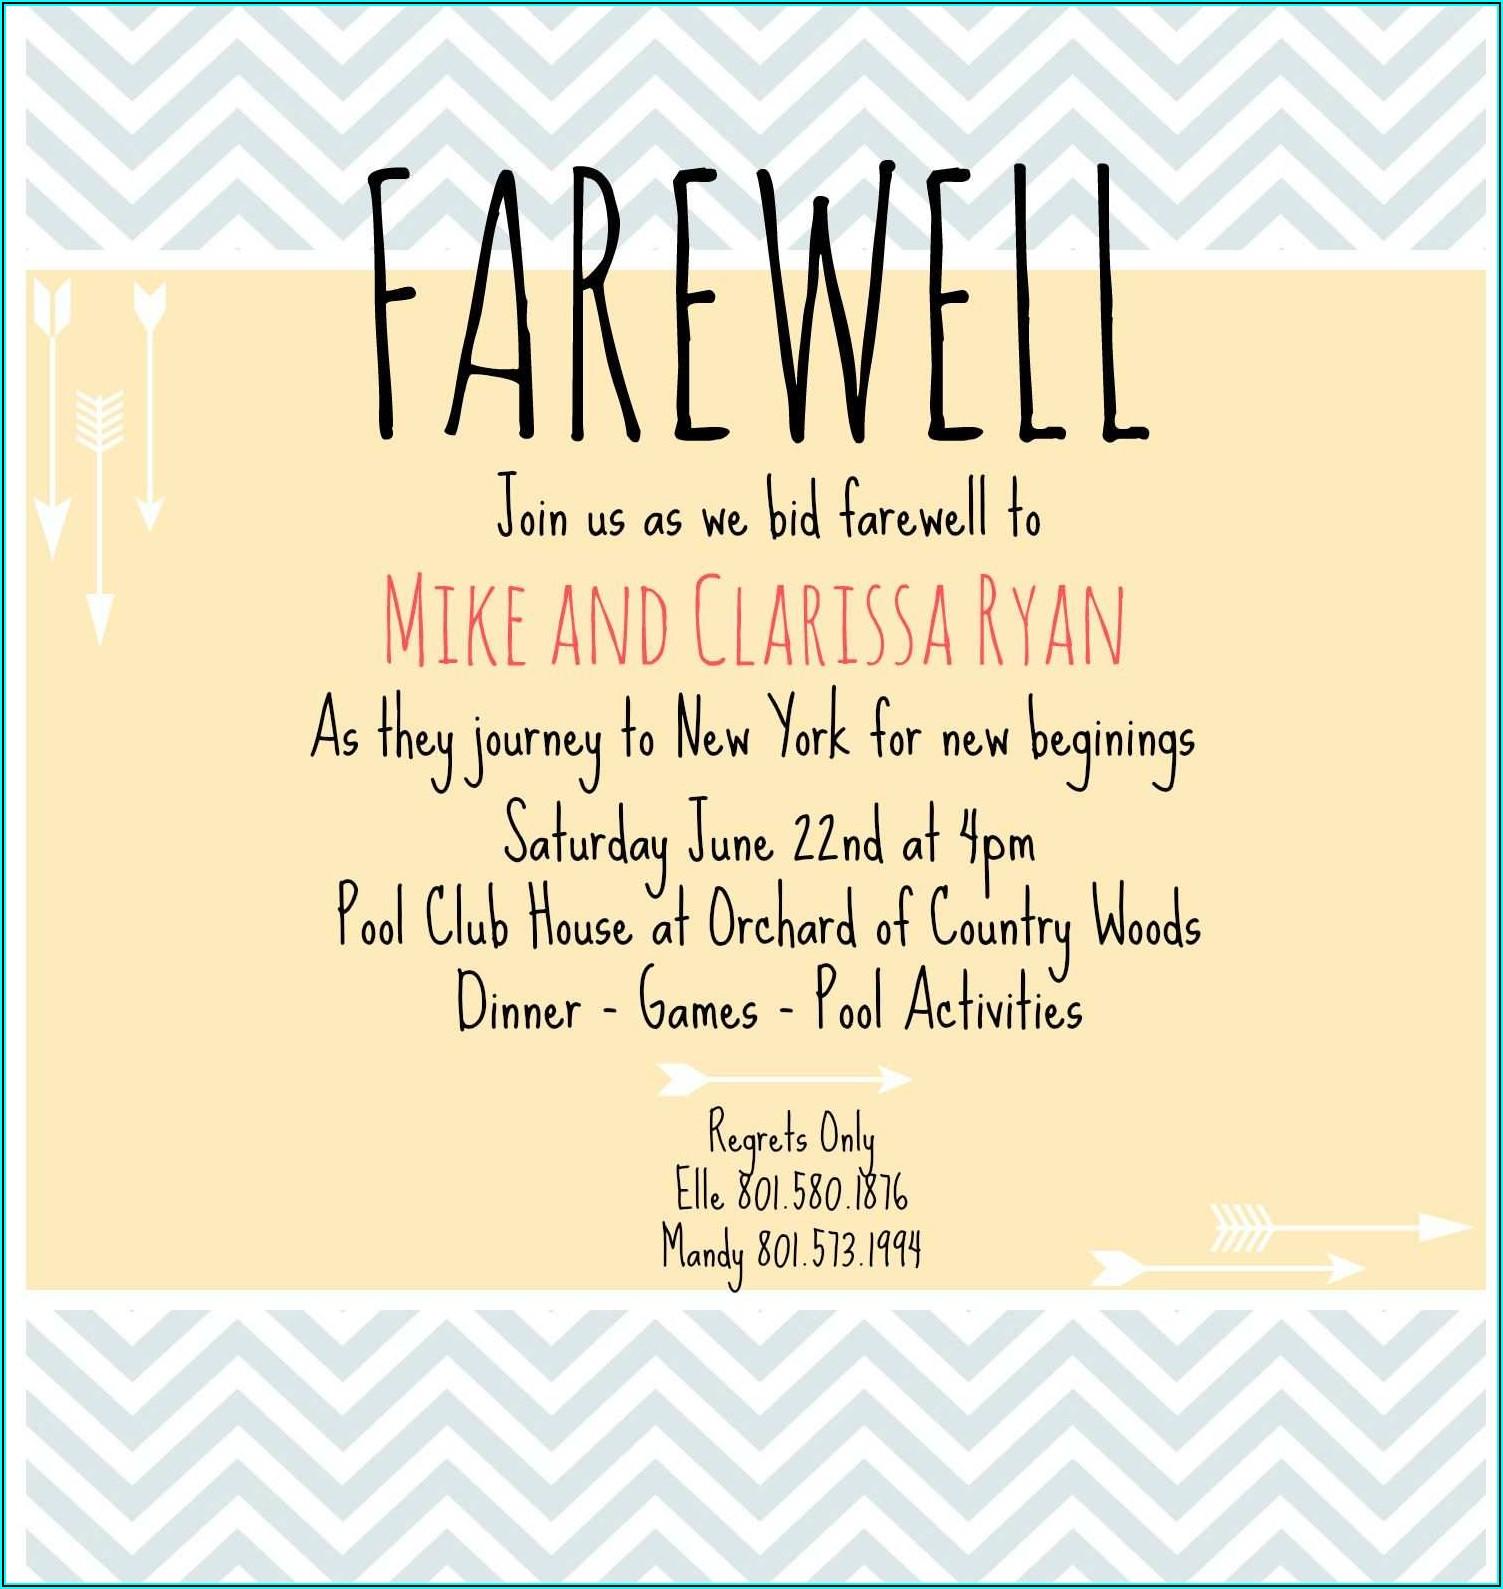 Free Farewell Invitation Template Photoshop